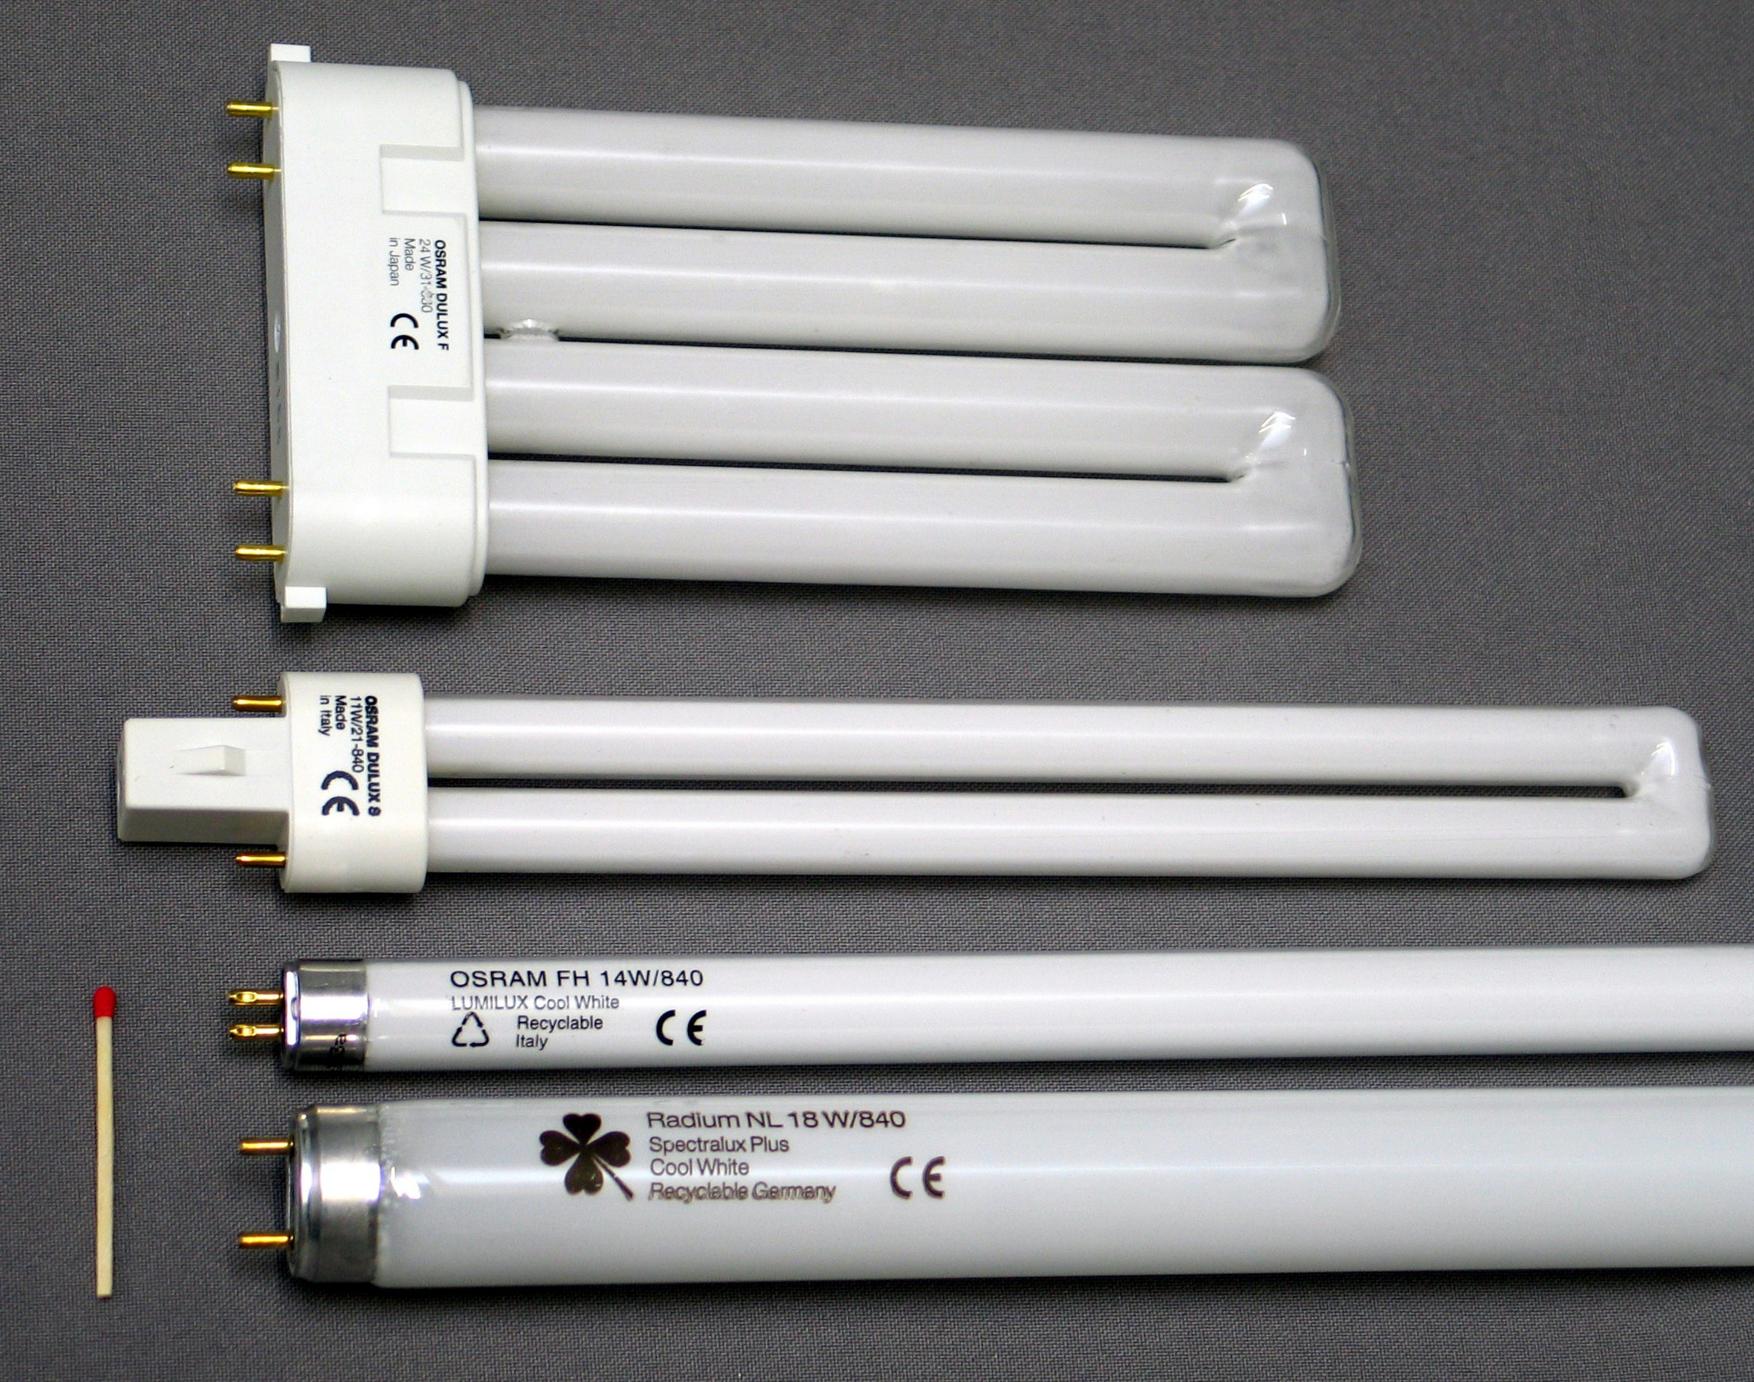 Lighting Comparison: LED vs Fluorescent and CFL